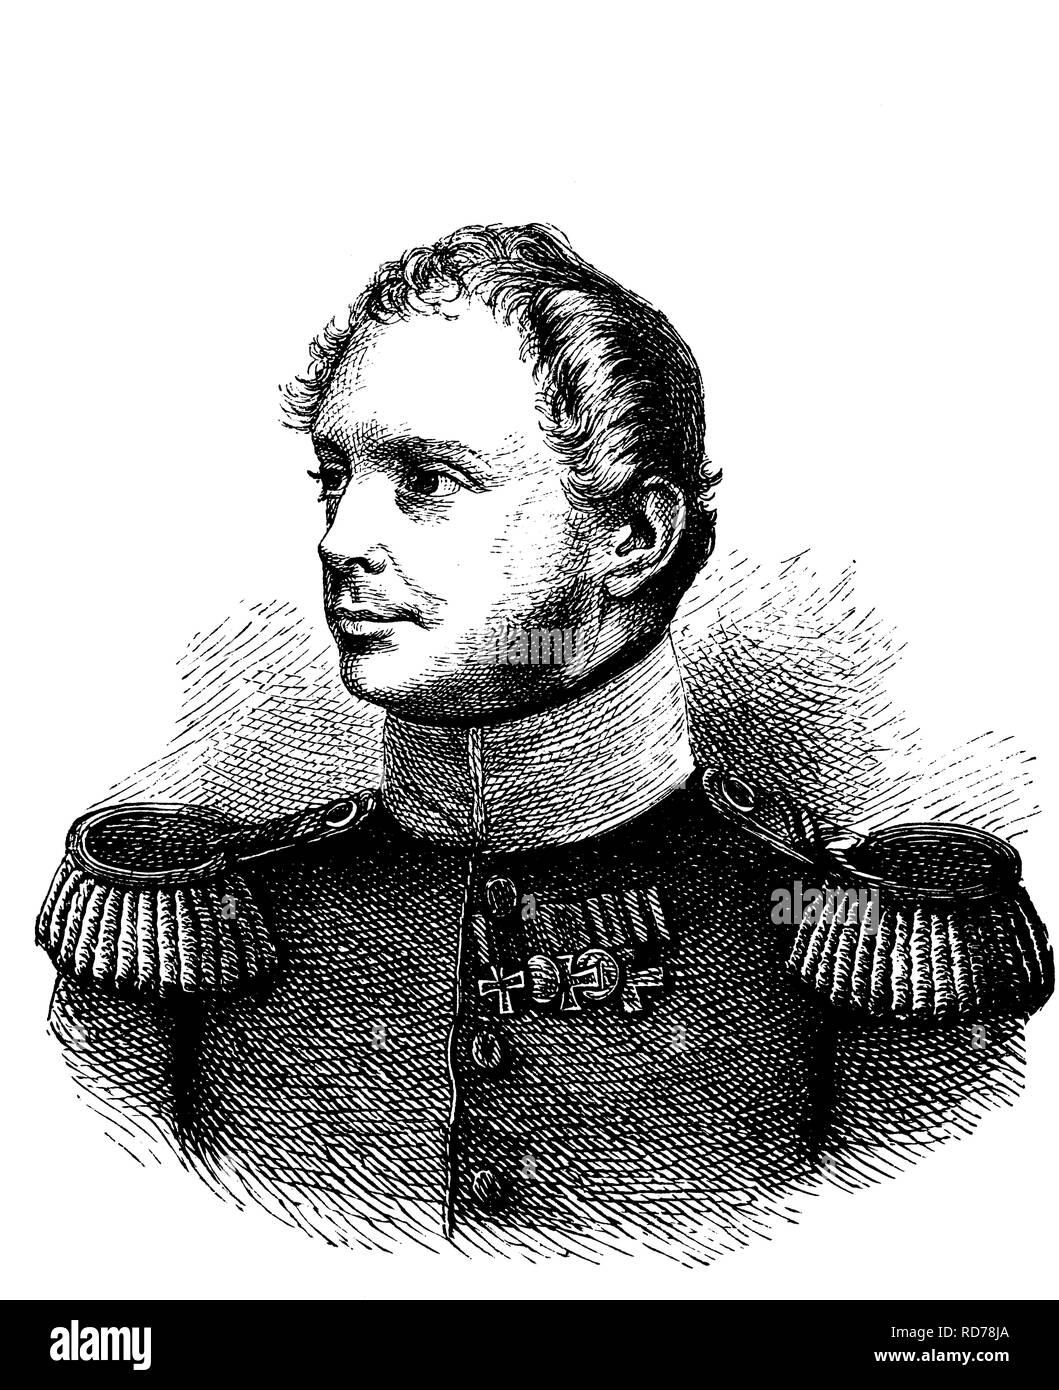 Friedrich Wilhelm IV, 1795 - 1861, King of Prussia, historical woodcut, circa 1880 - Stock Image